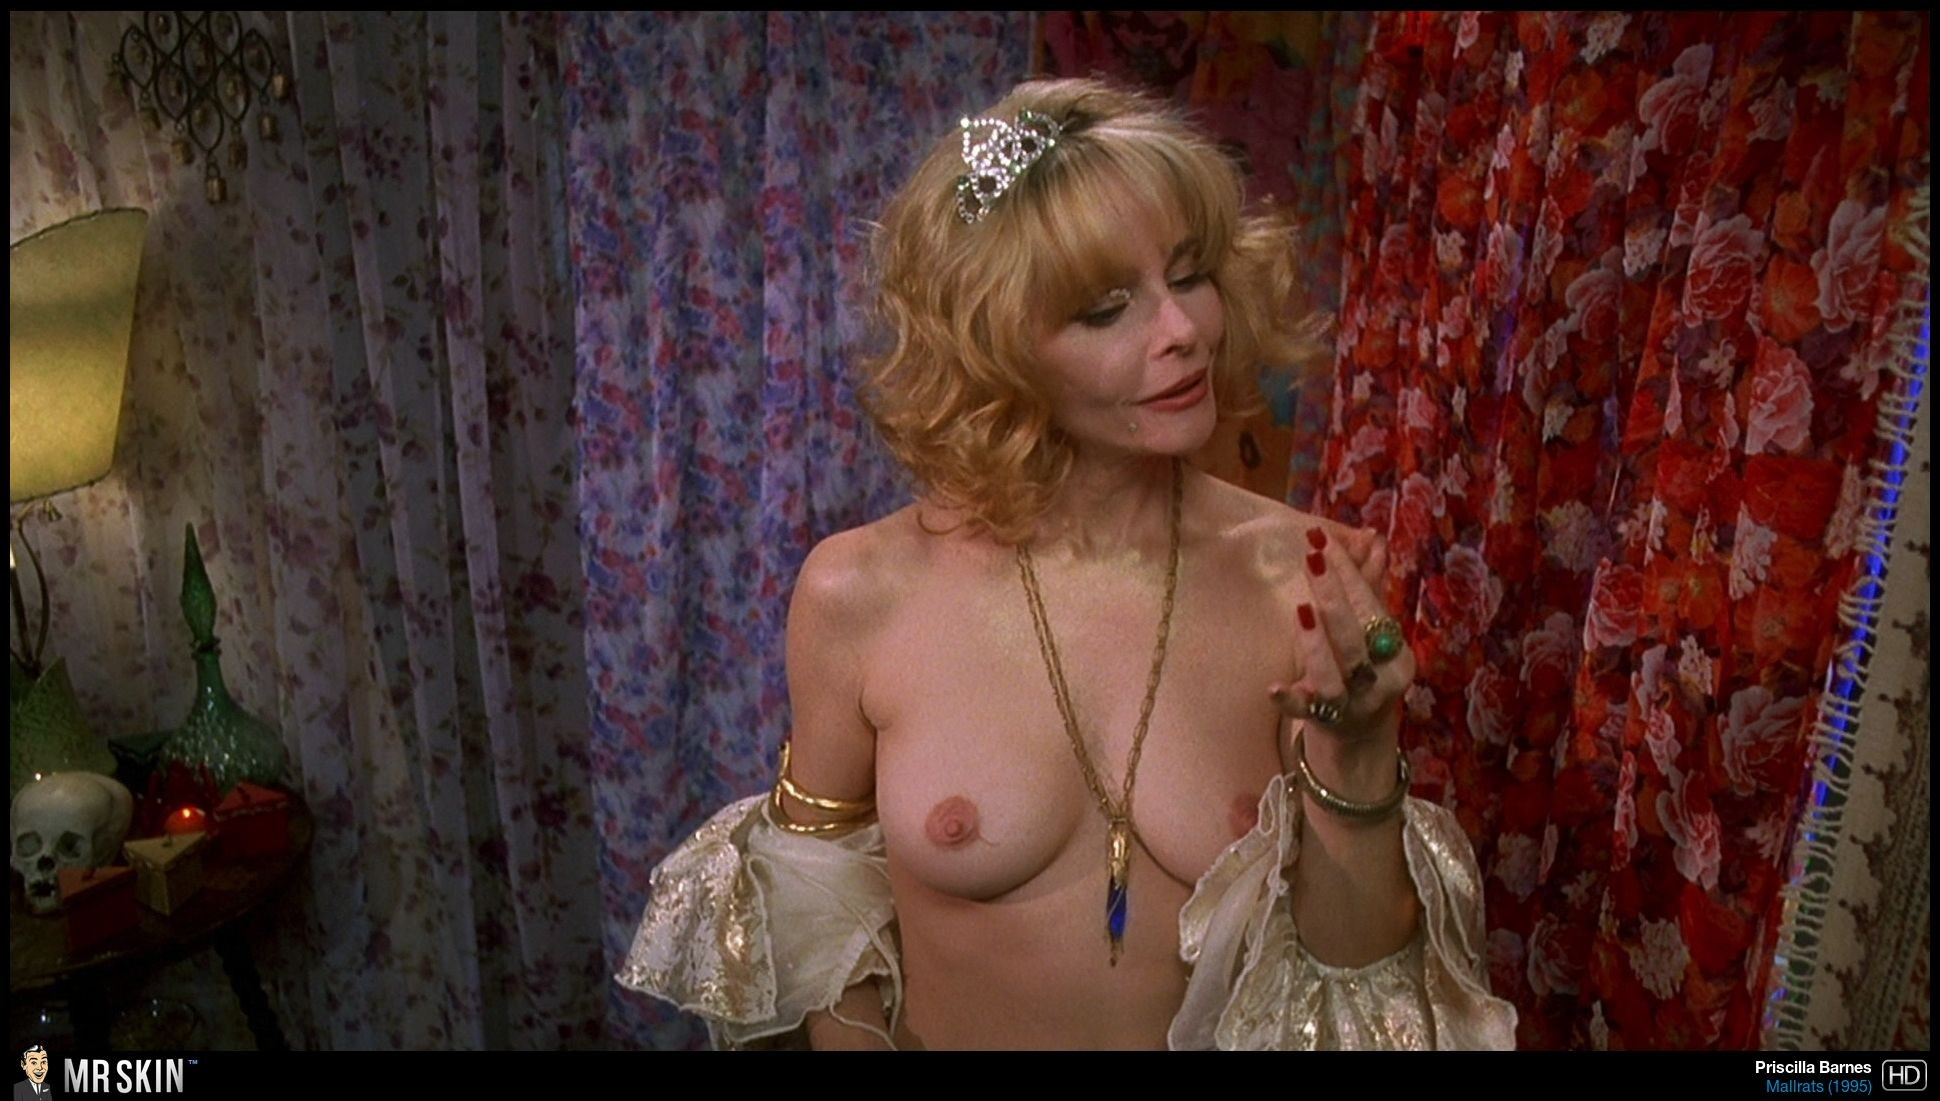 Priscilla barnes nude